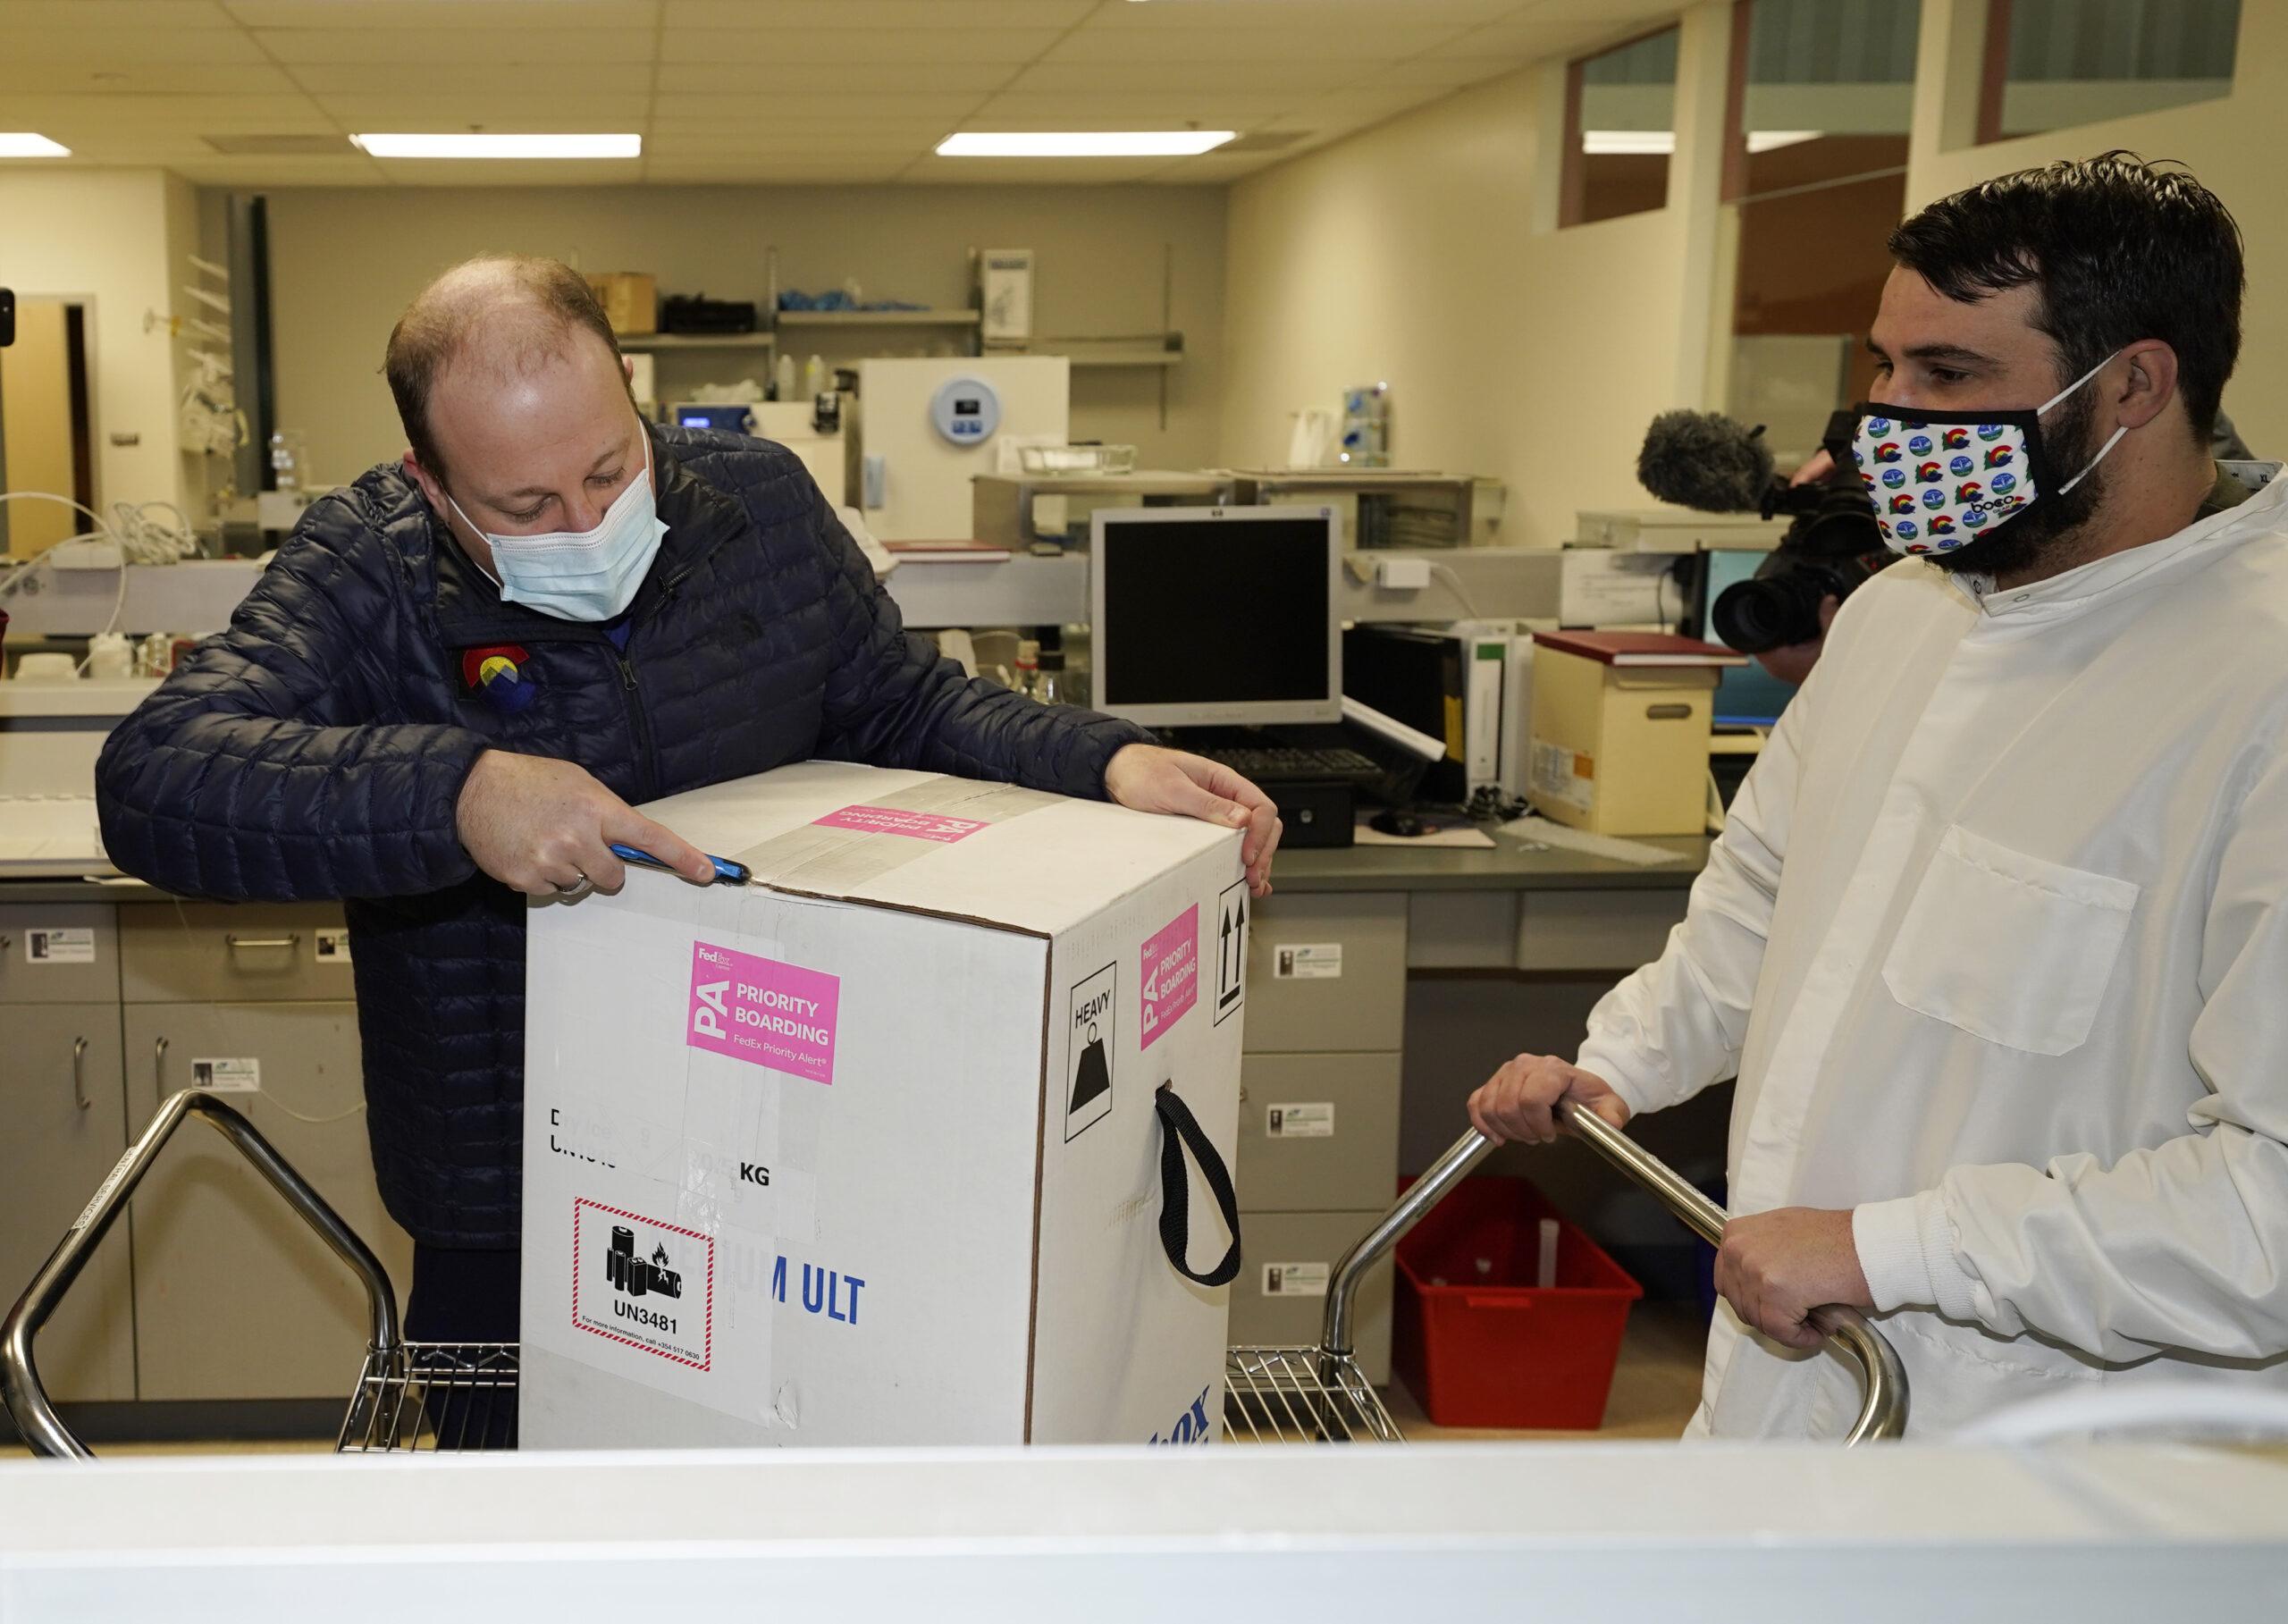 Polis COVID-19 Coronavirus Vaccine Delivery